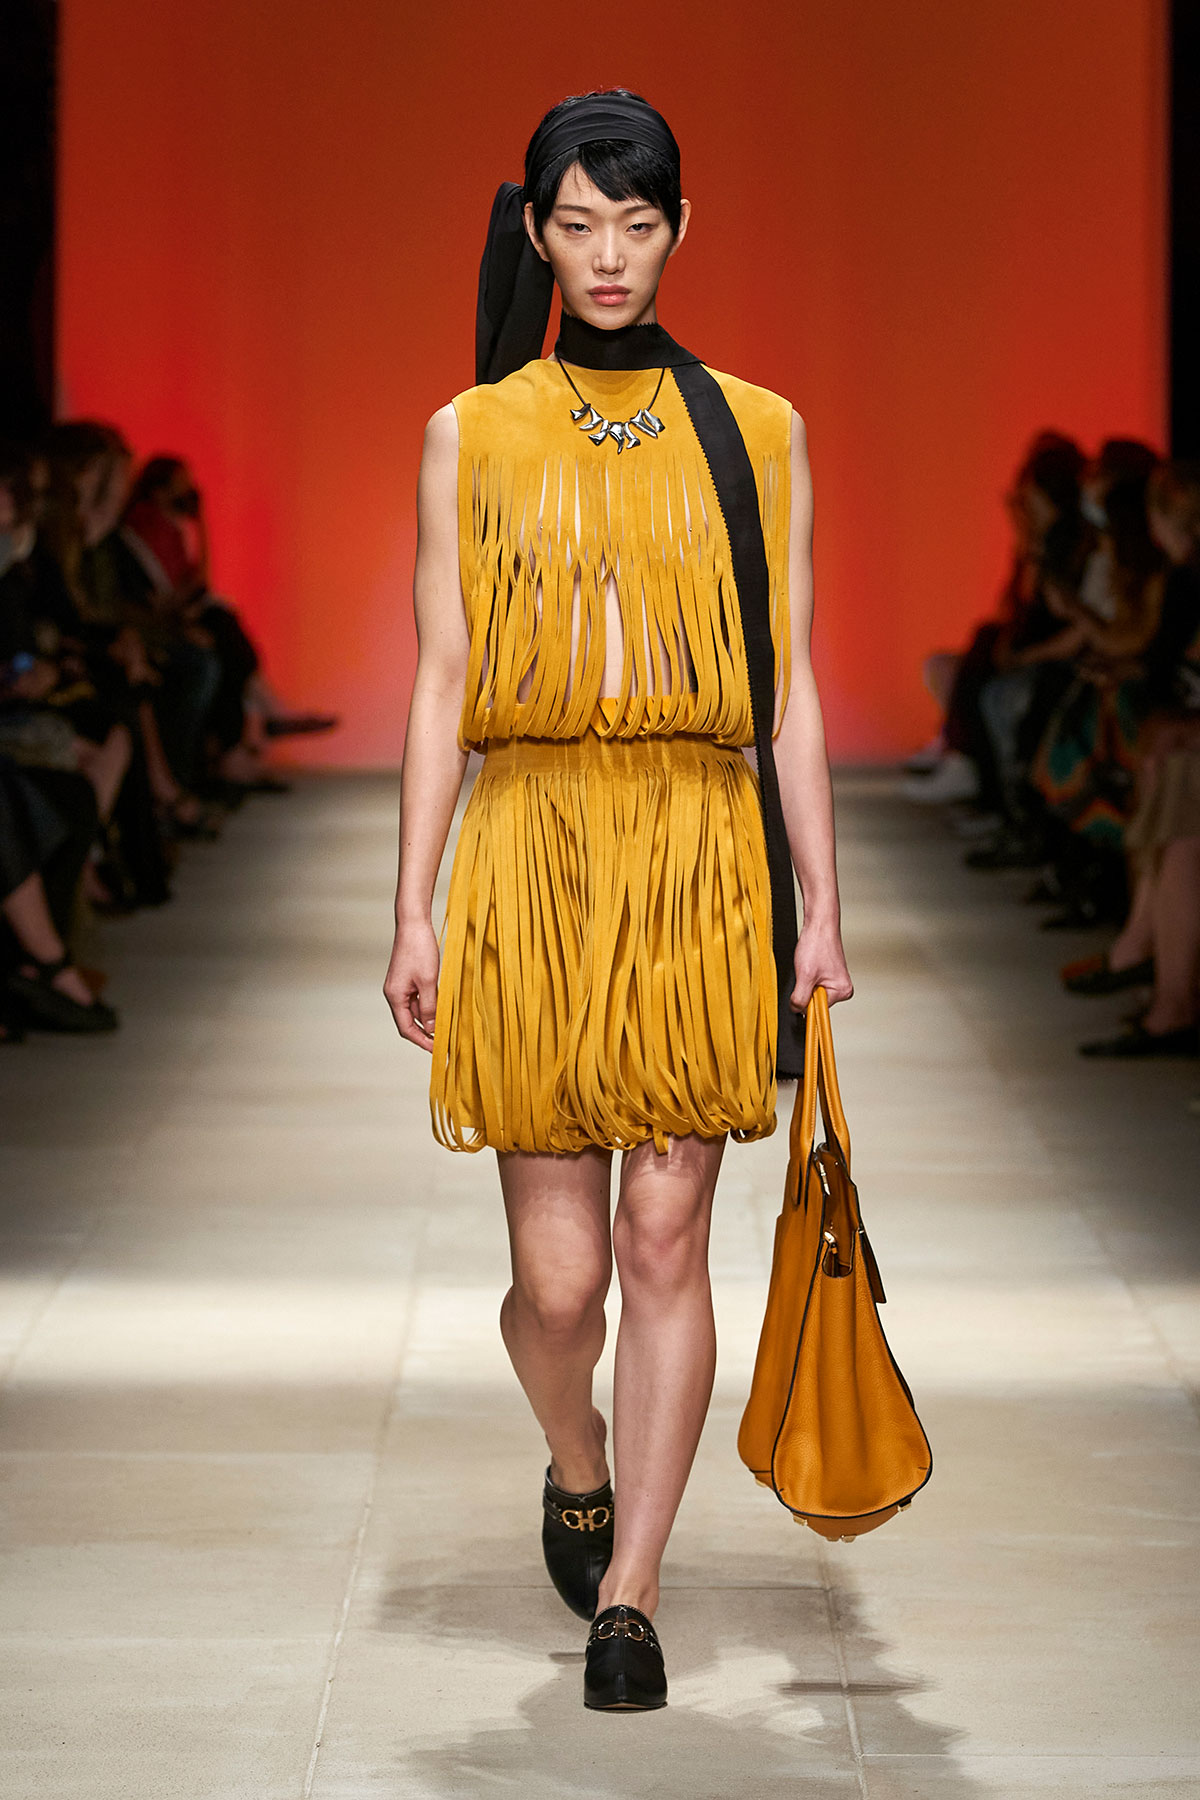 Salvatore Ferragamo Spring Summer 2022 Collection